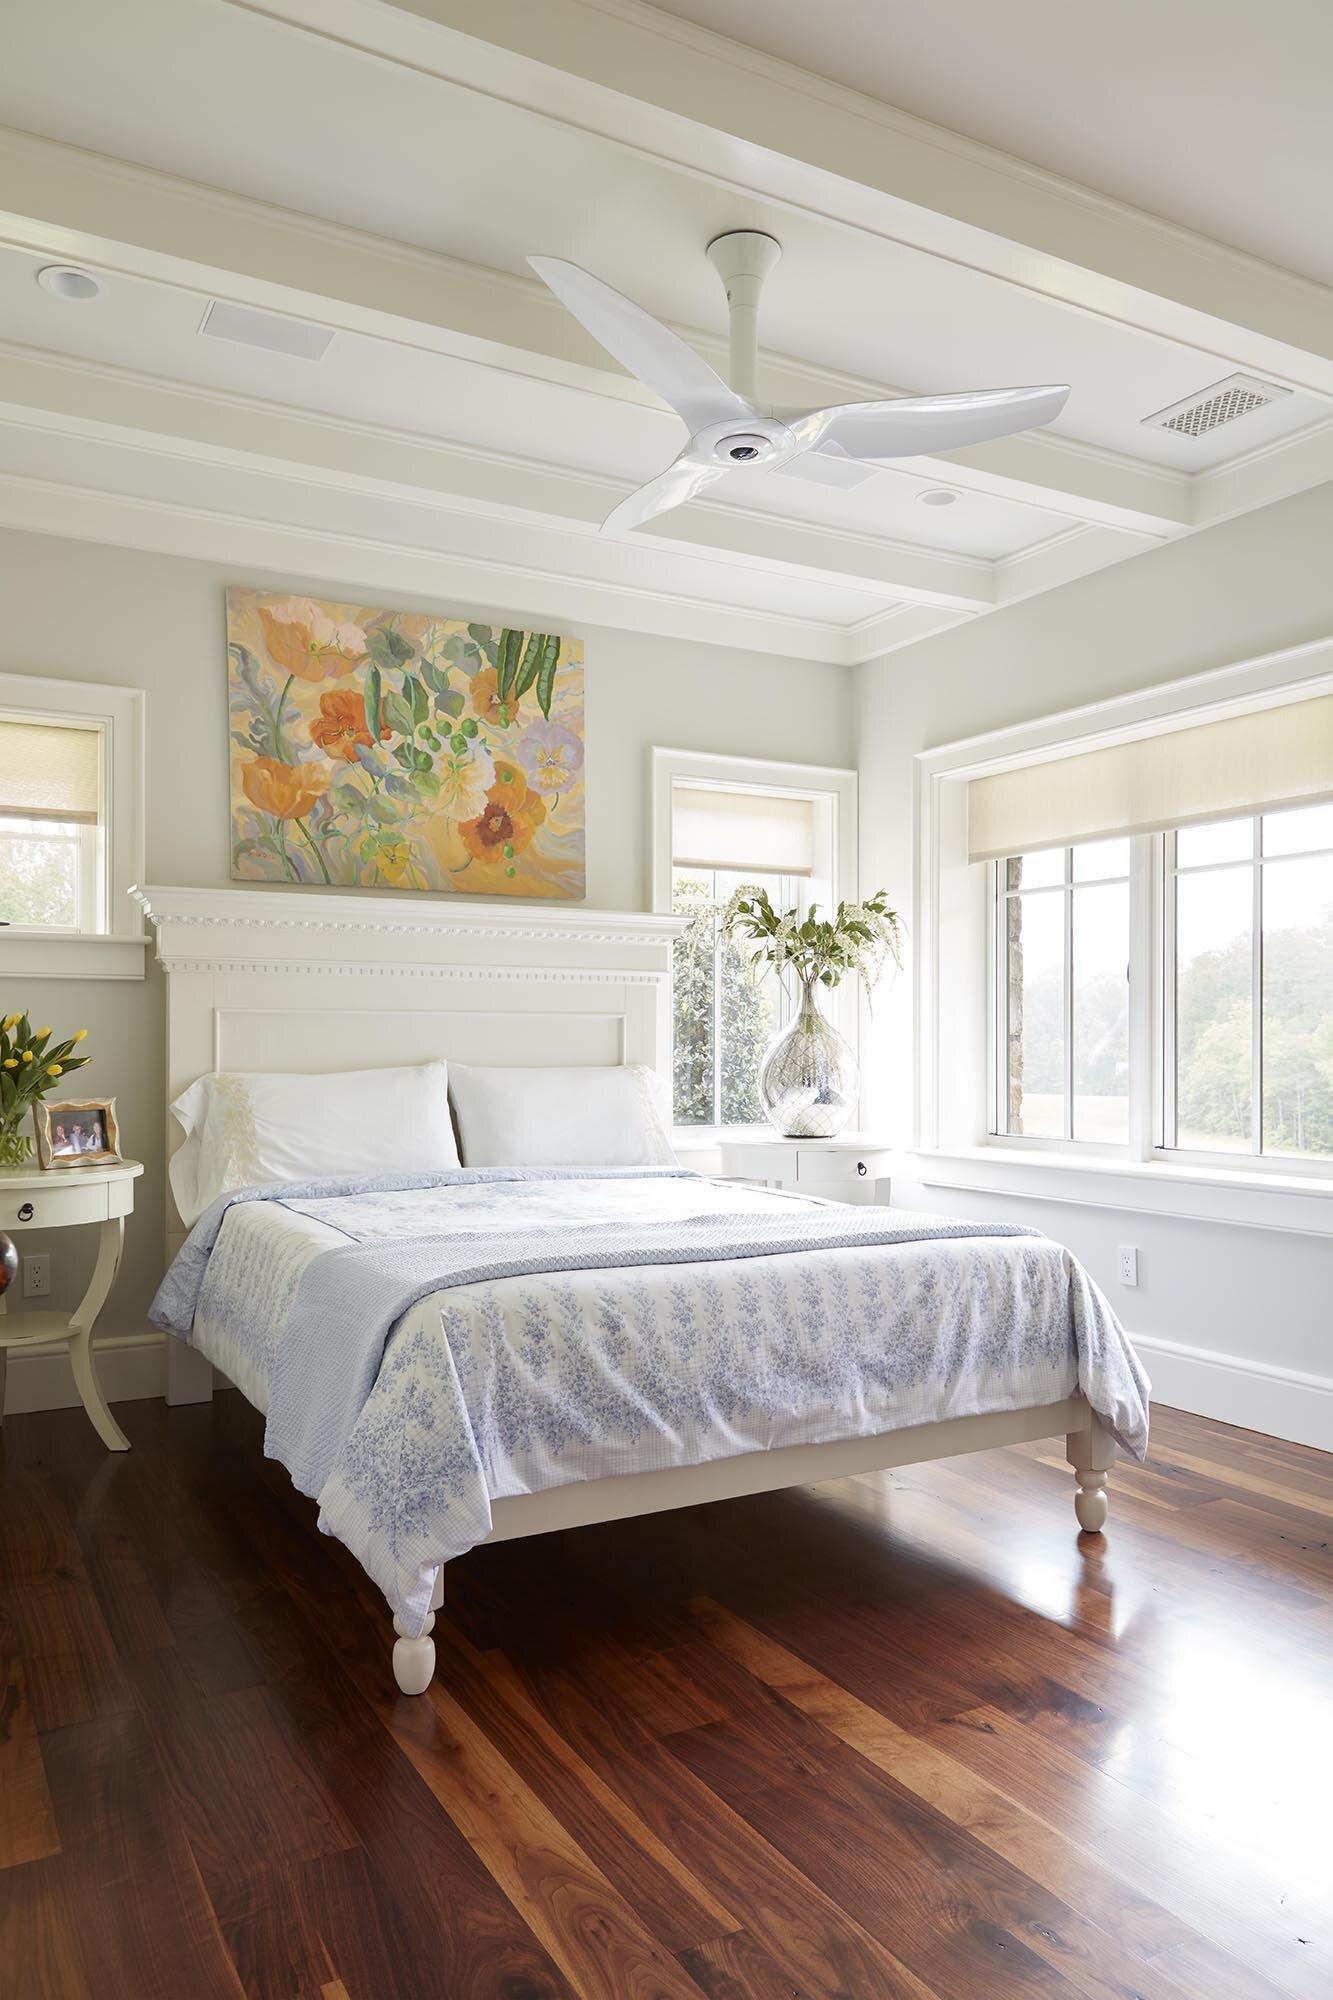 BedroomAlt2_Overall.jpg